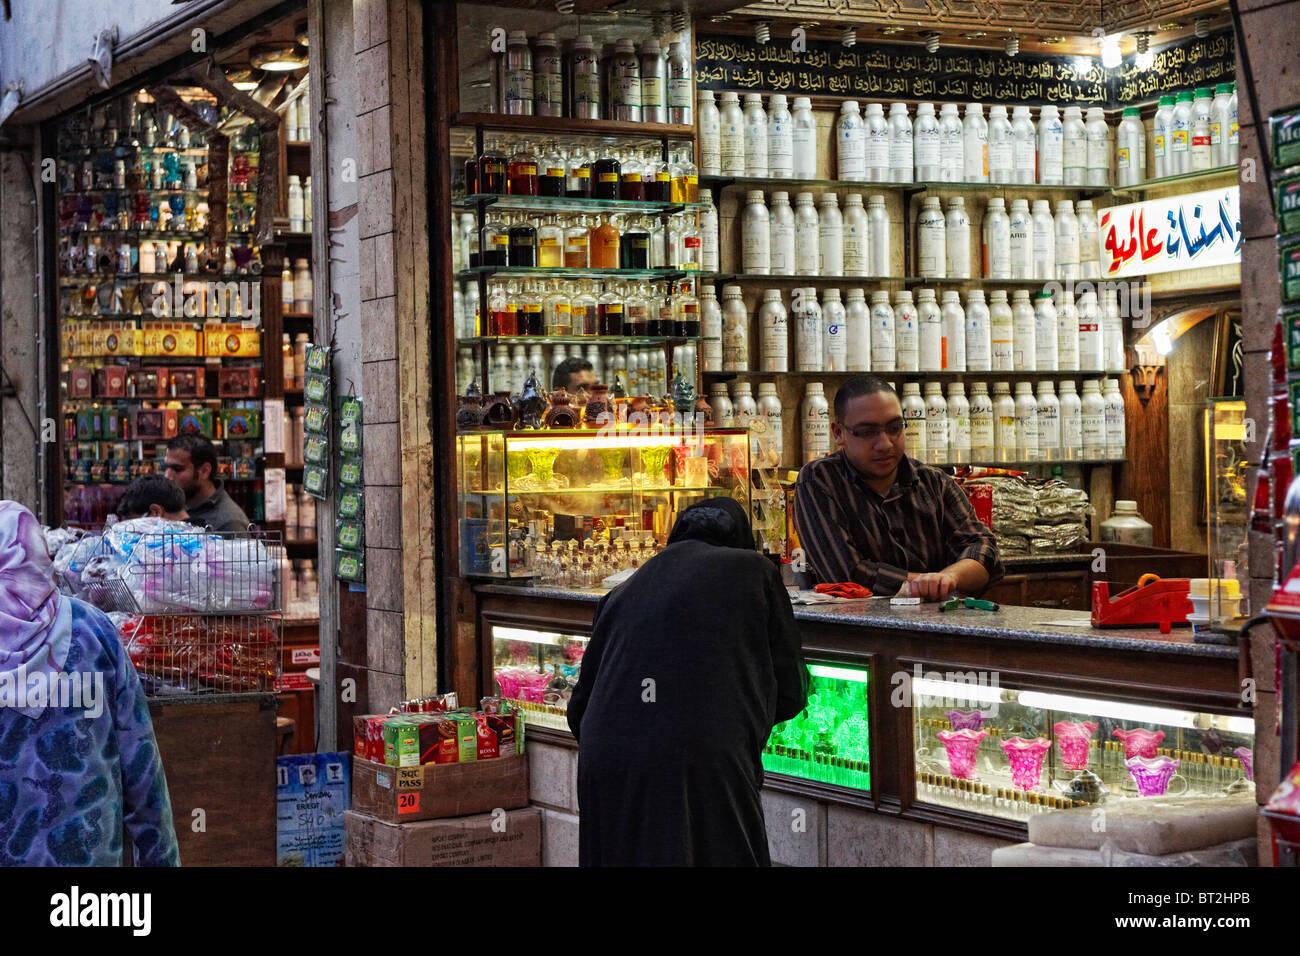 Perfume market khan al khalili bazar in cairo egypt for Cairo outlet